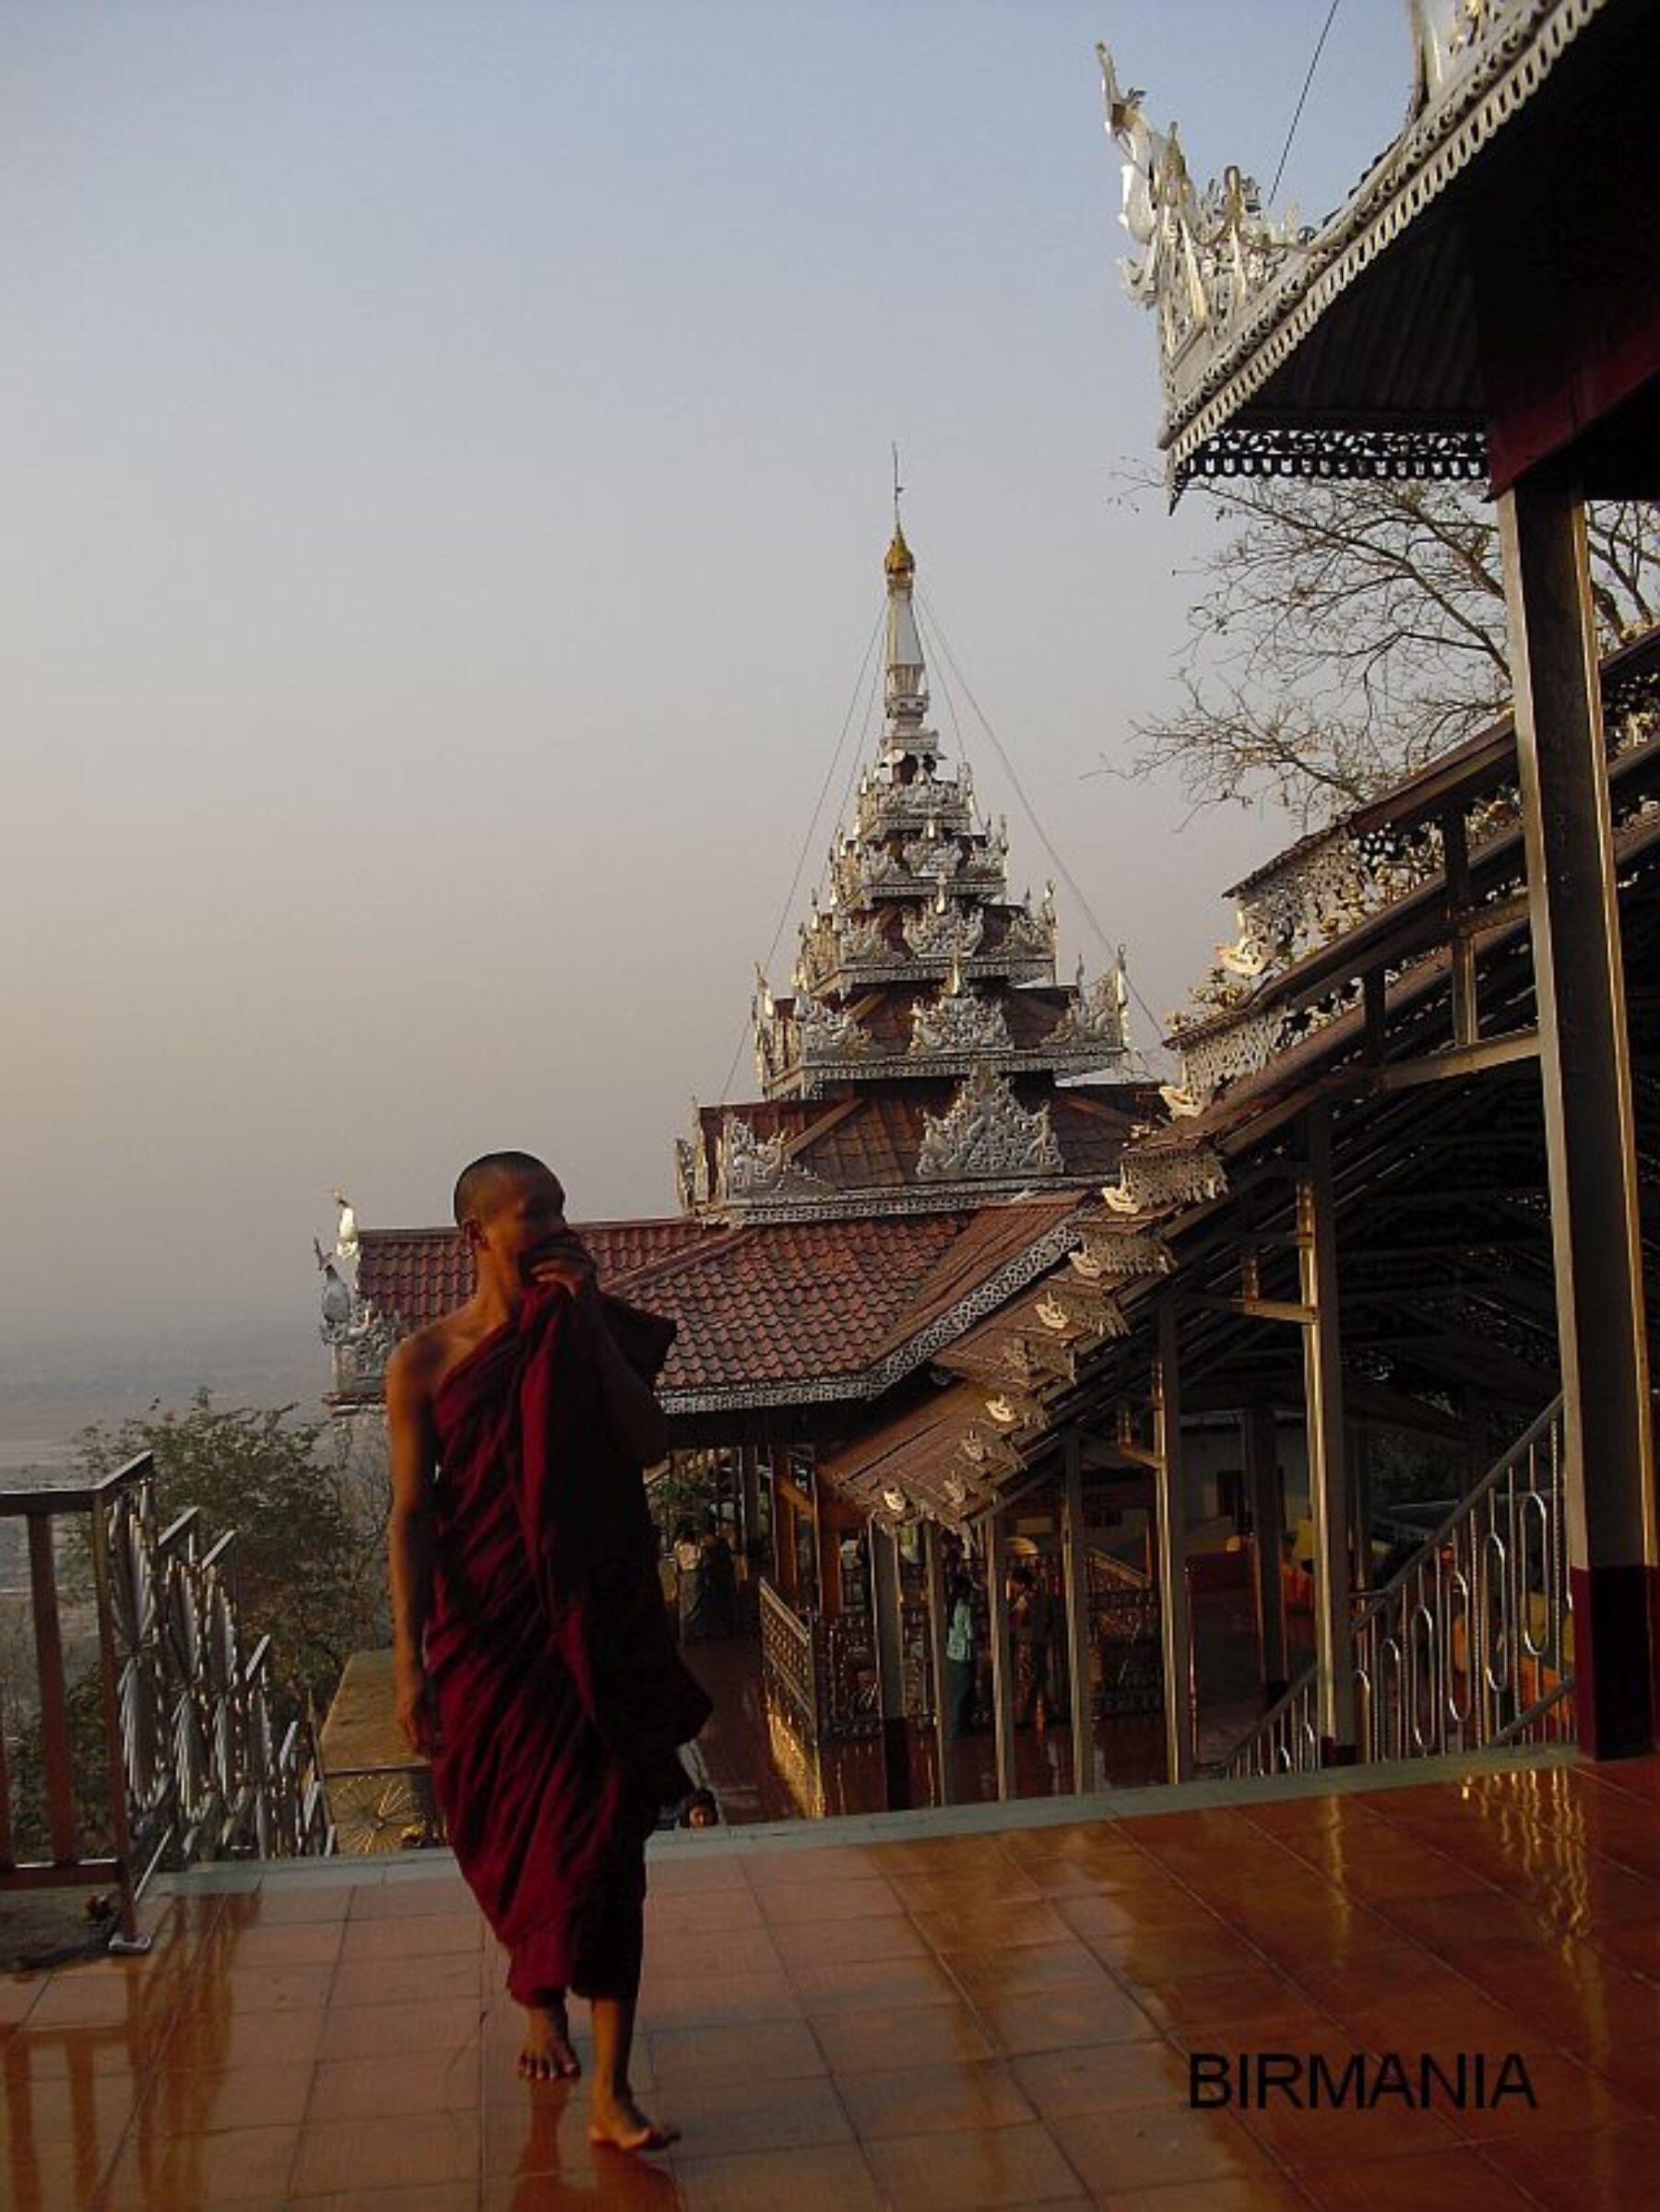 Birmania S